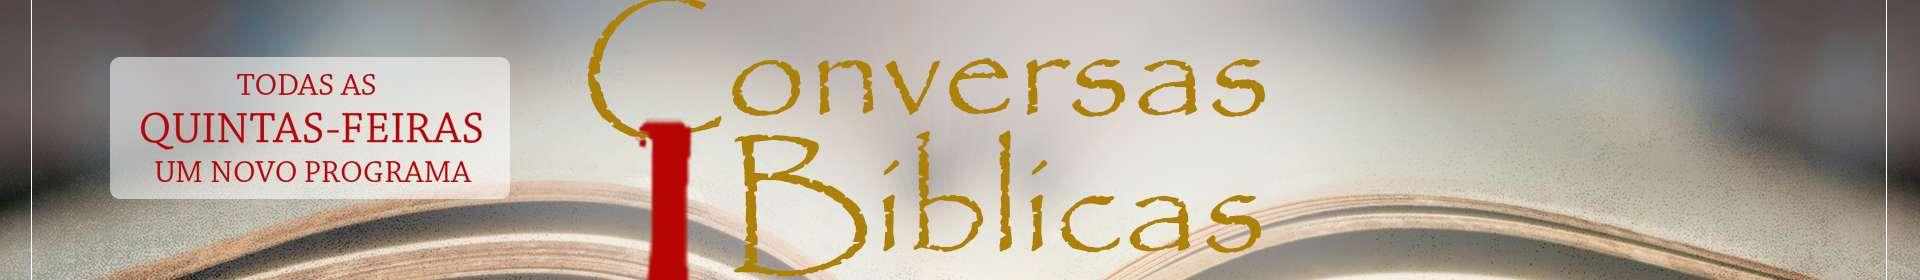 Conversas Bíblicas: Corpo Vivo e Corpo Morto - Parte 3